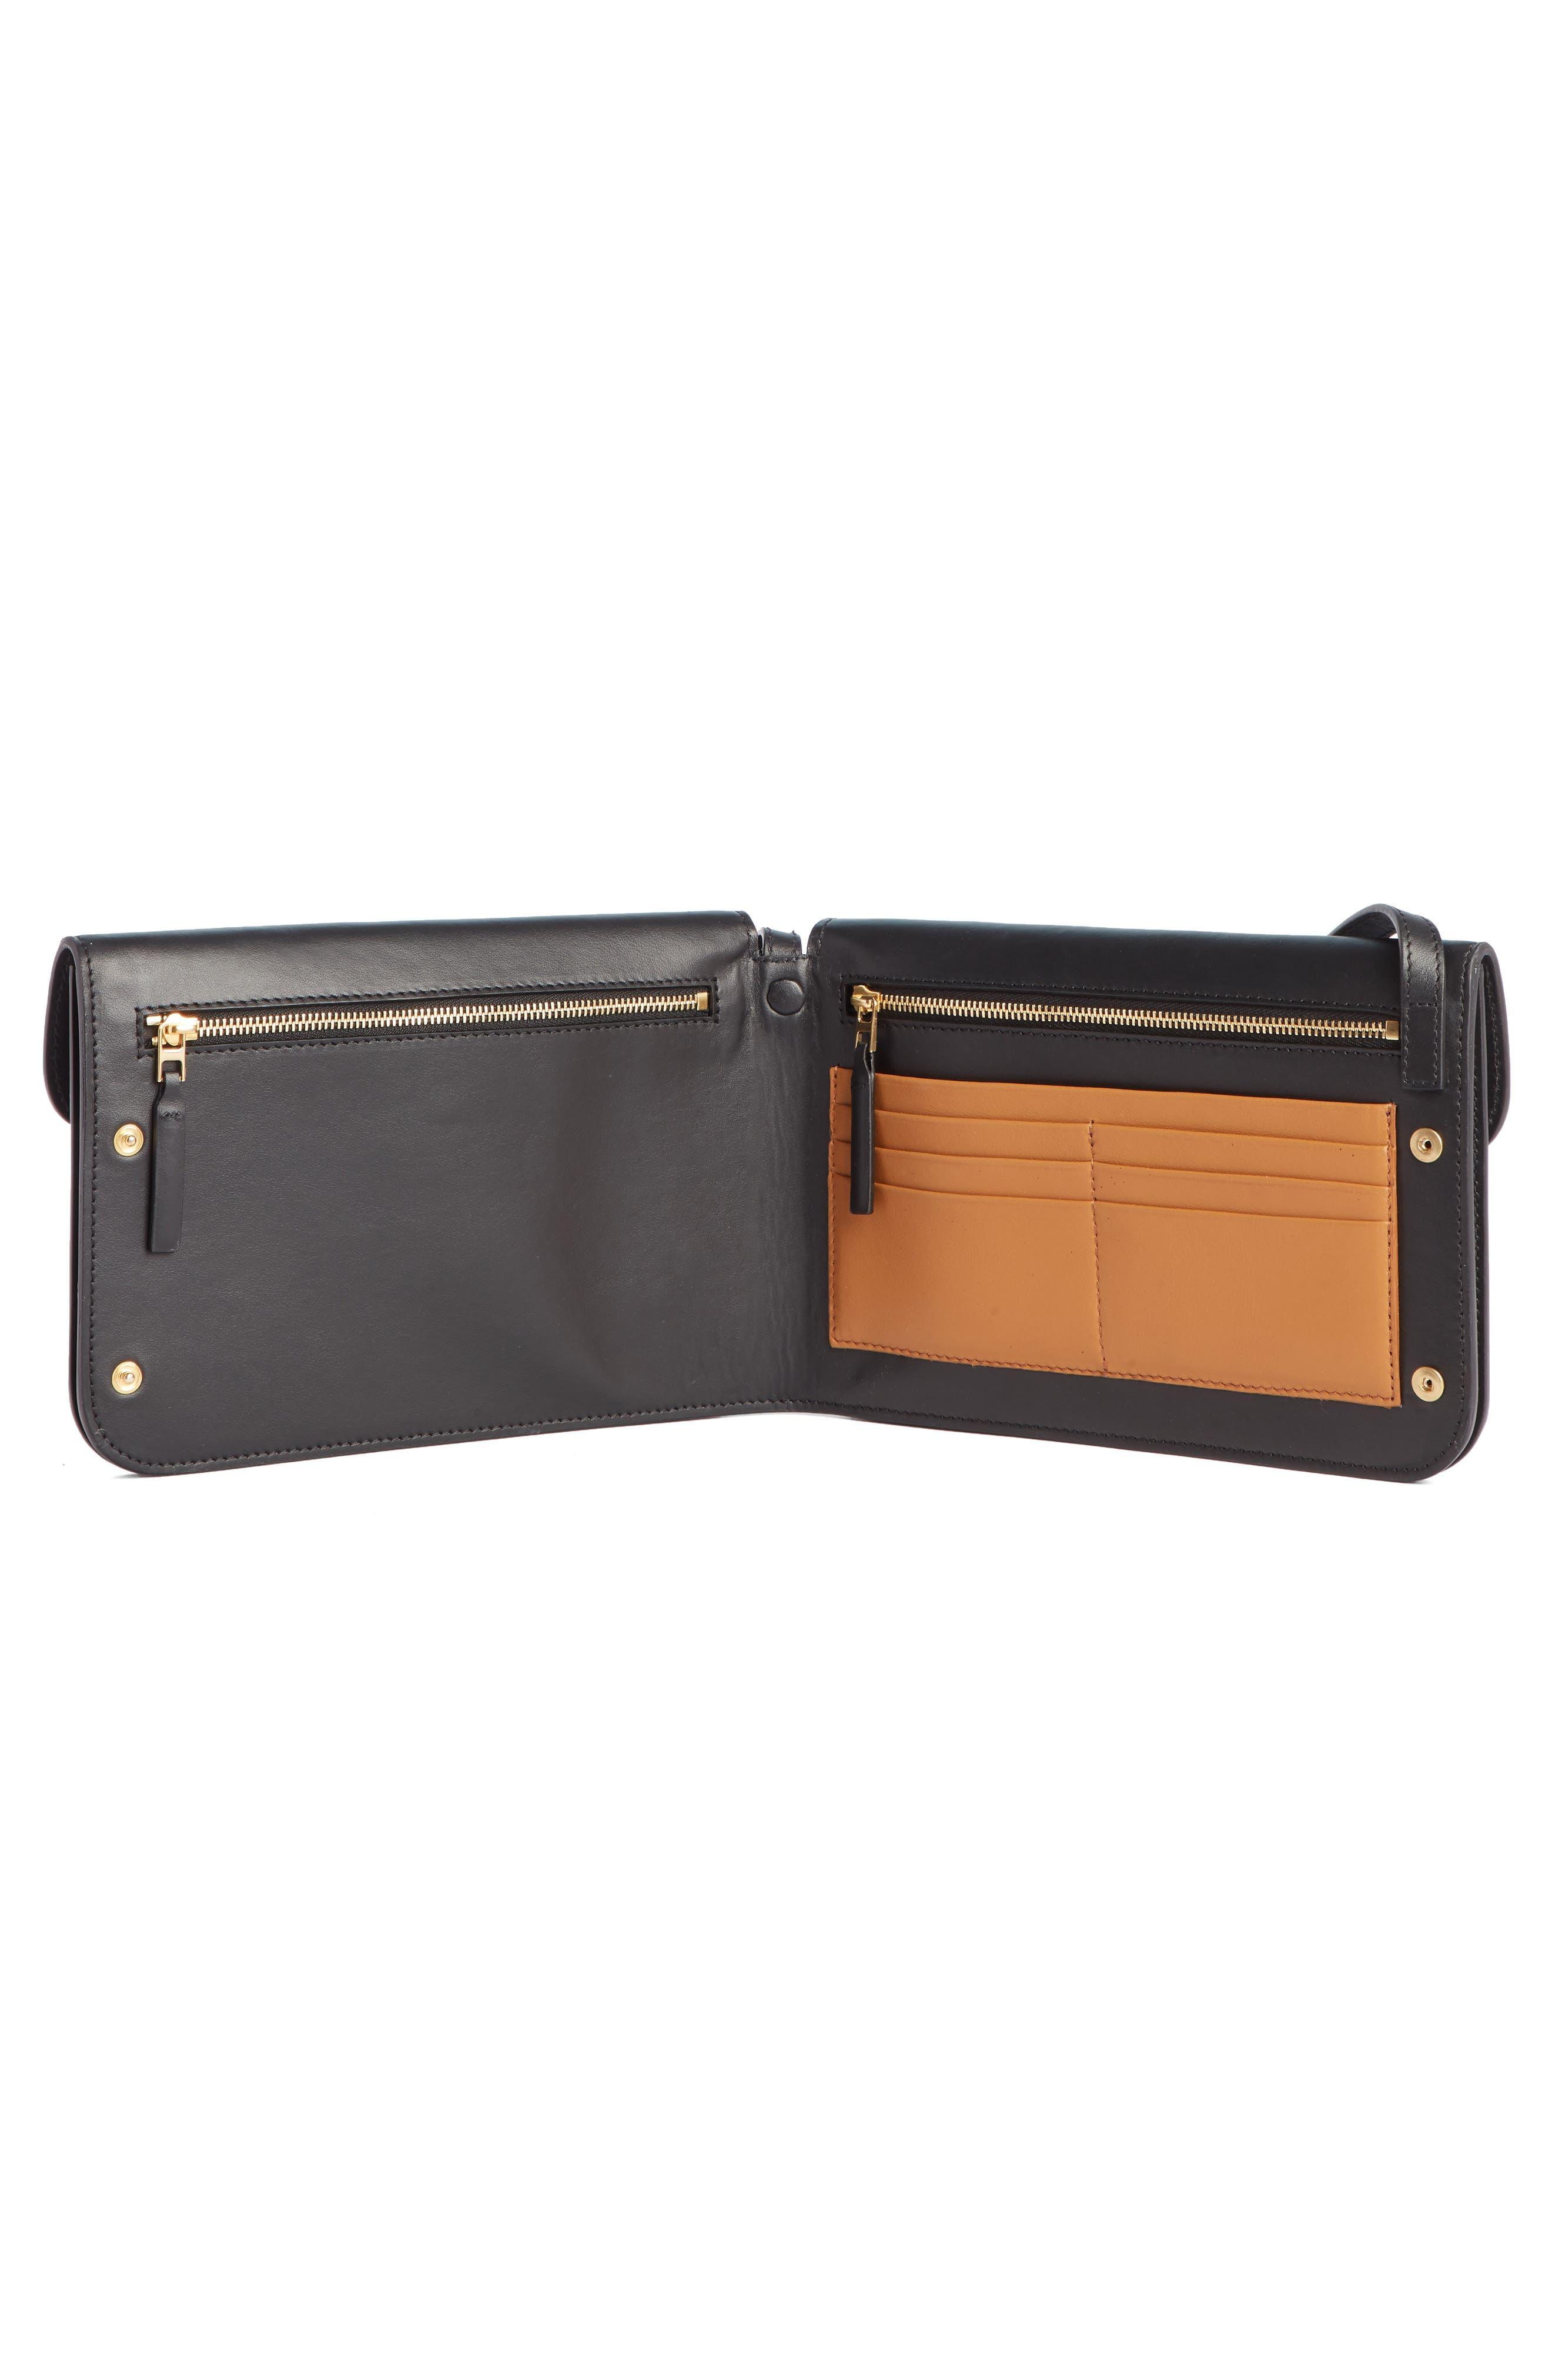 VICTORIA BECKHAM, Twin Leather Crossbody Bag, Alternate thumbnail 4, color, BLACK